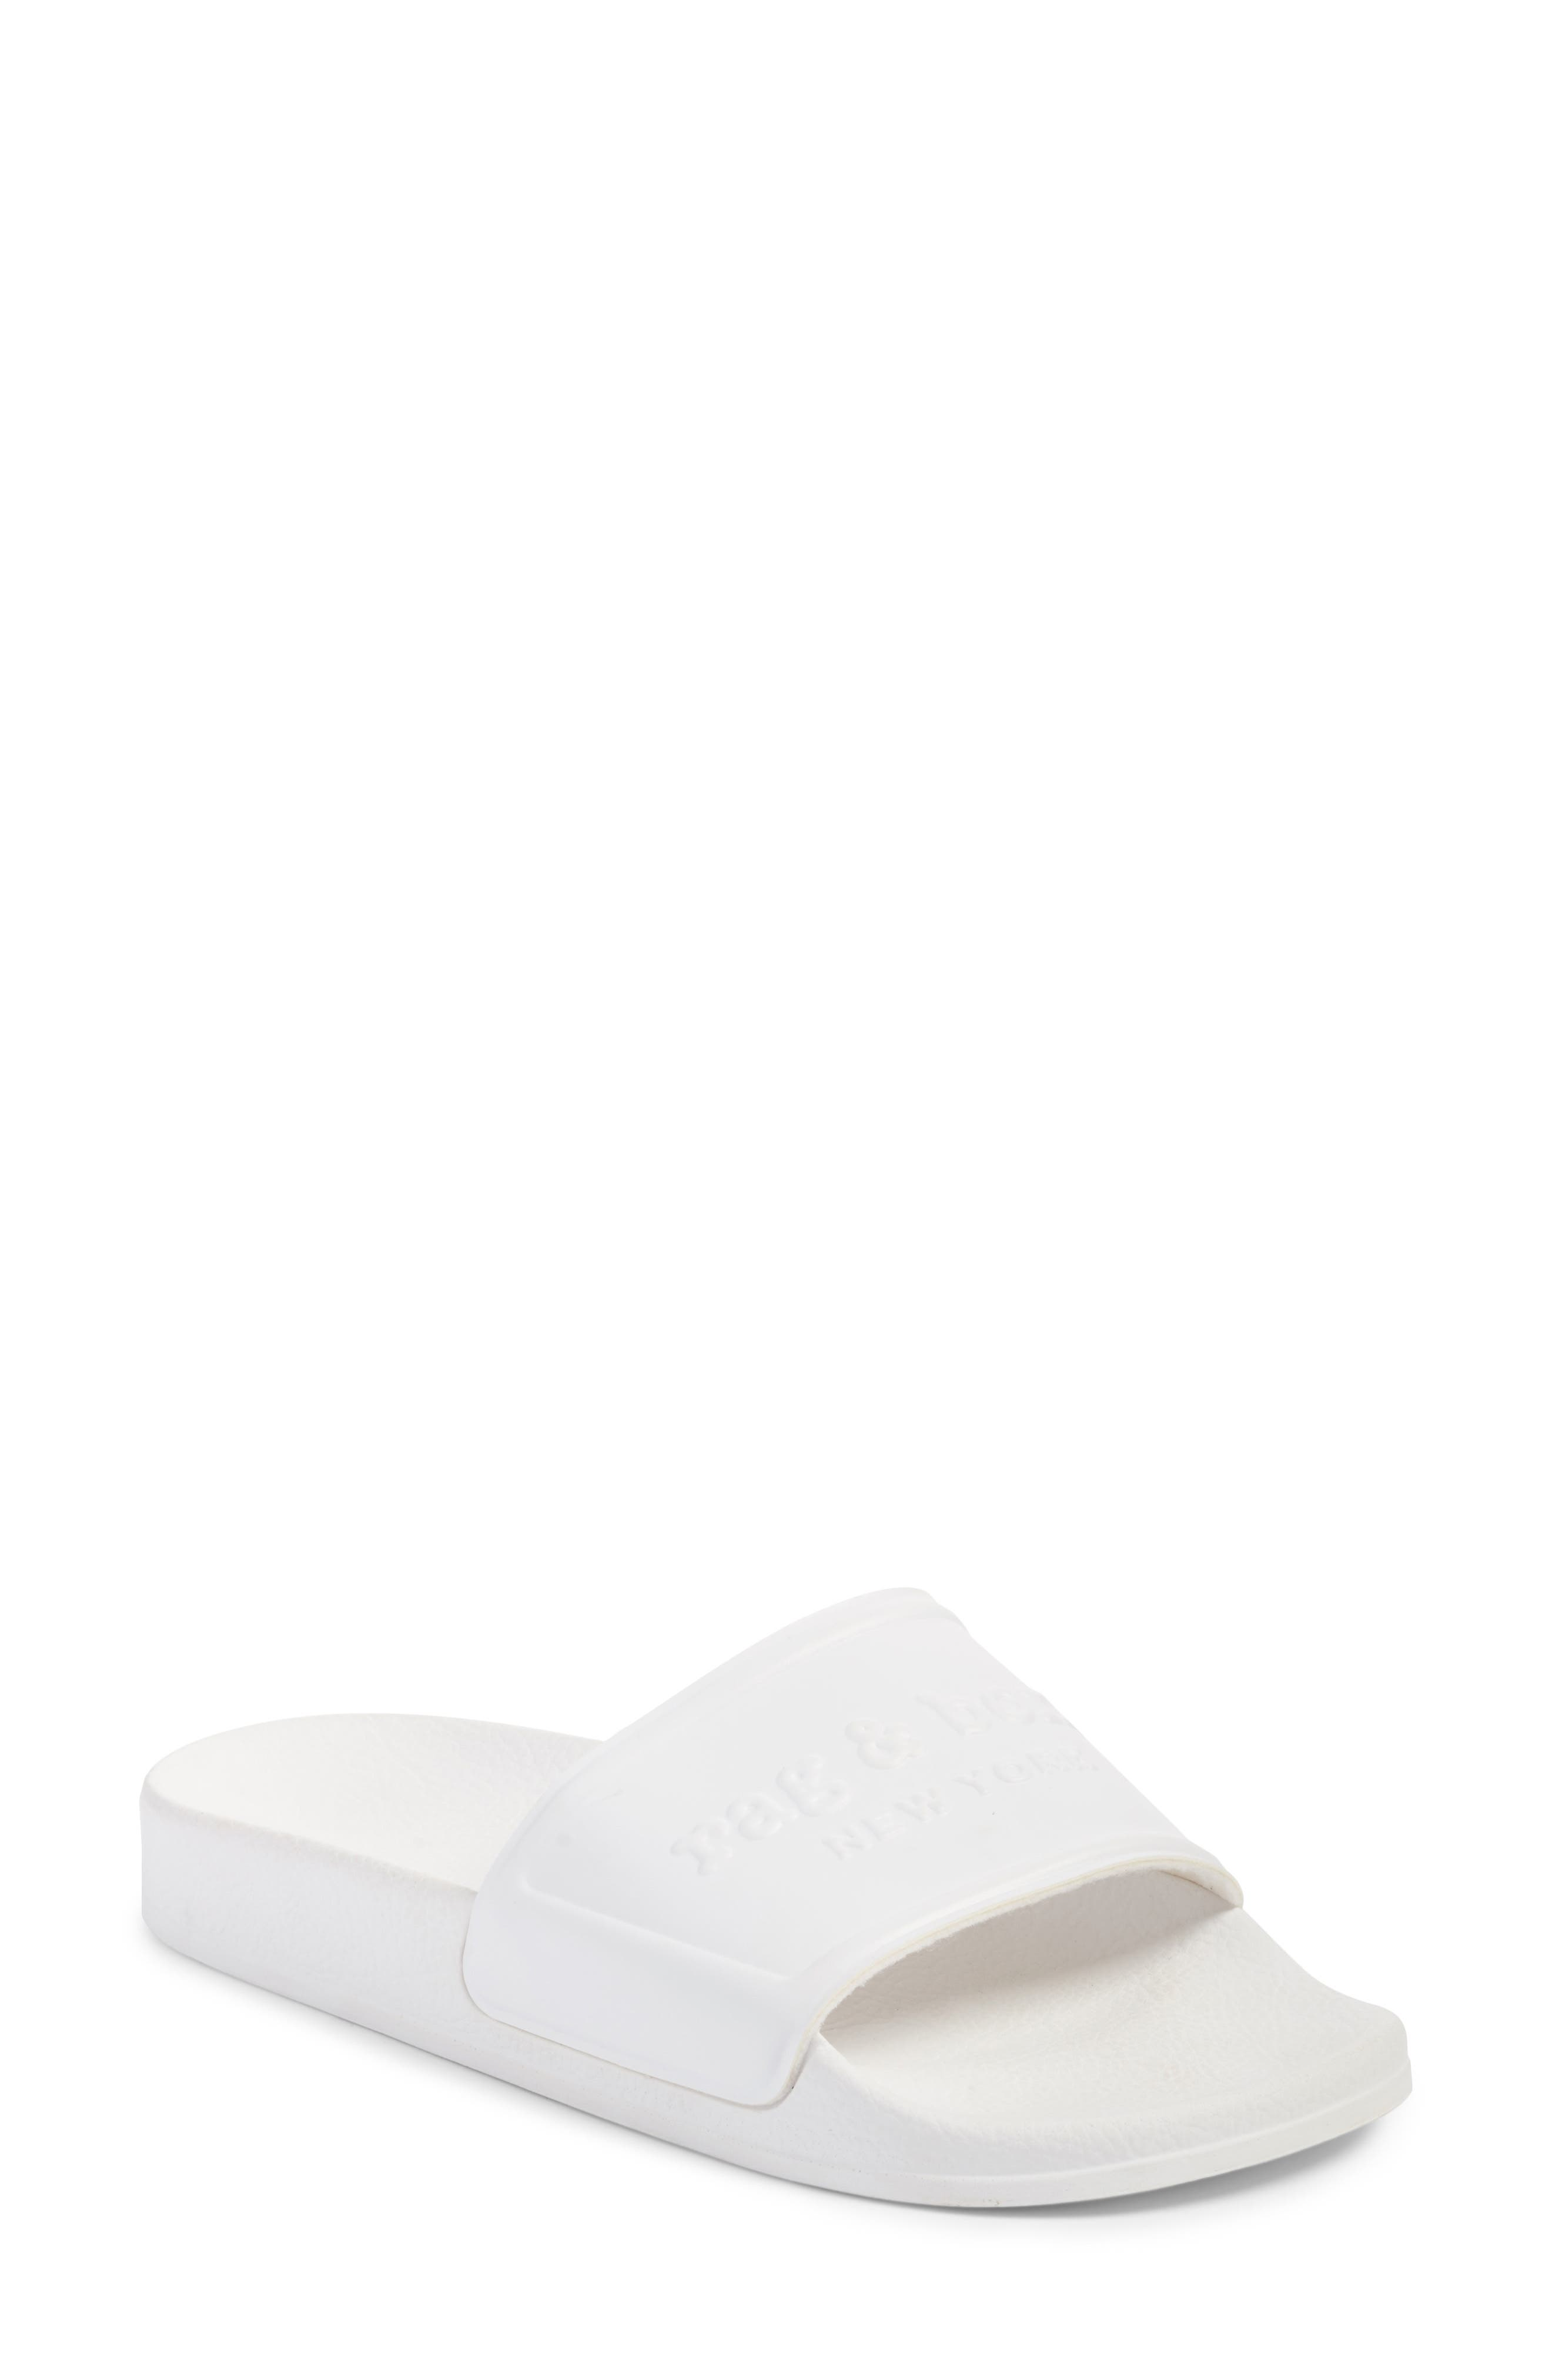 Main Image - rag & bone Pool Slide Sandal (Women)